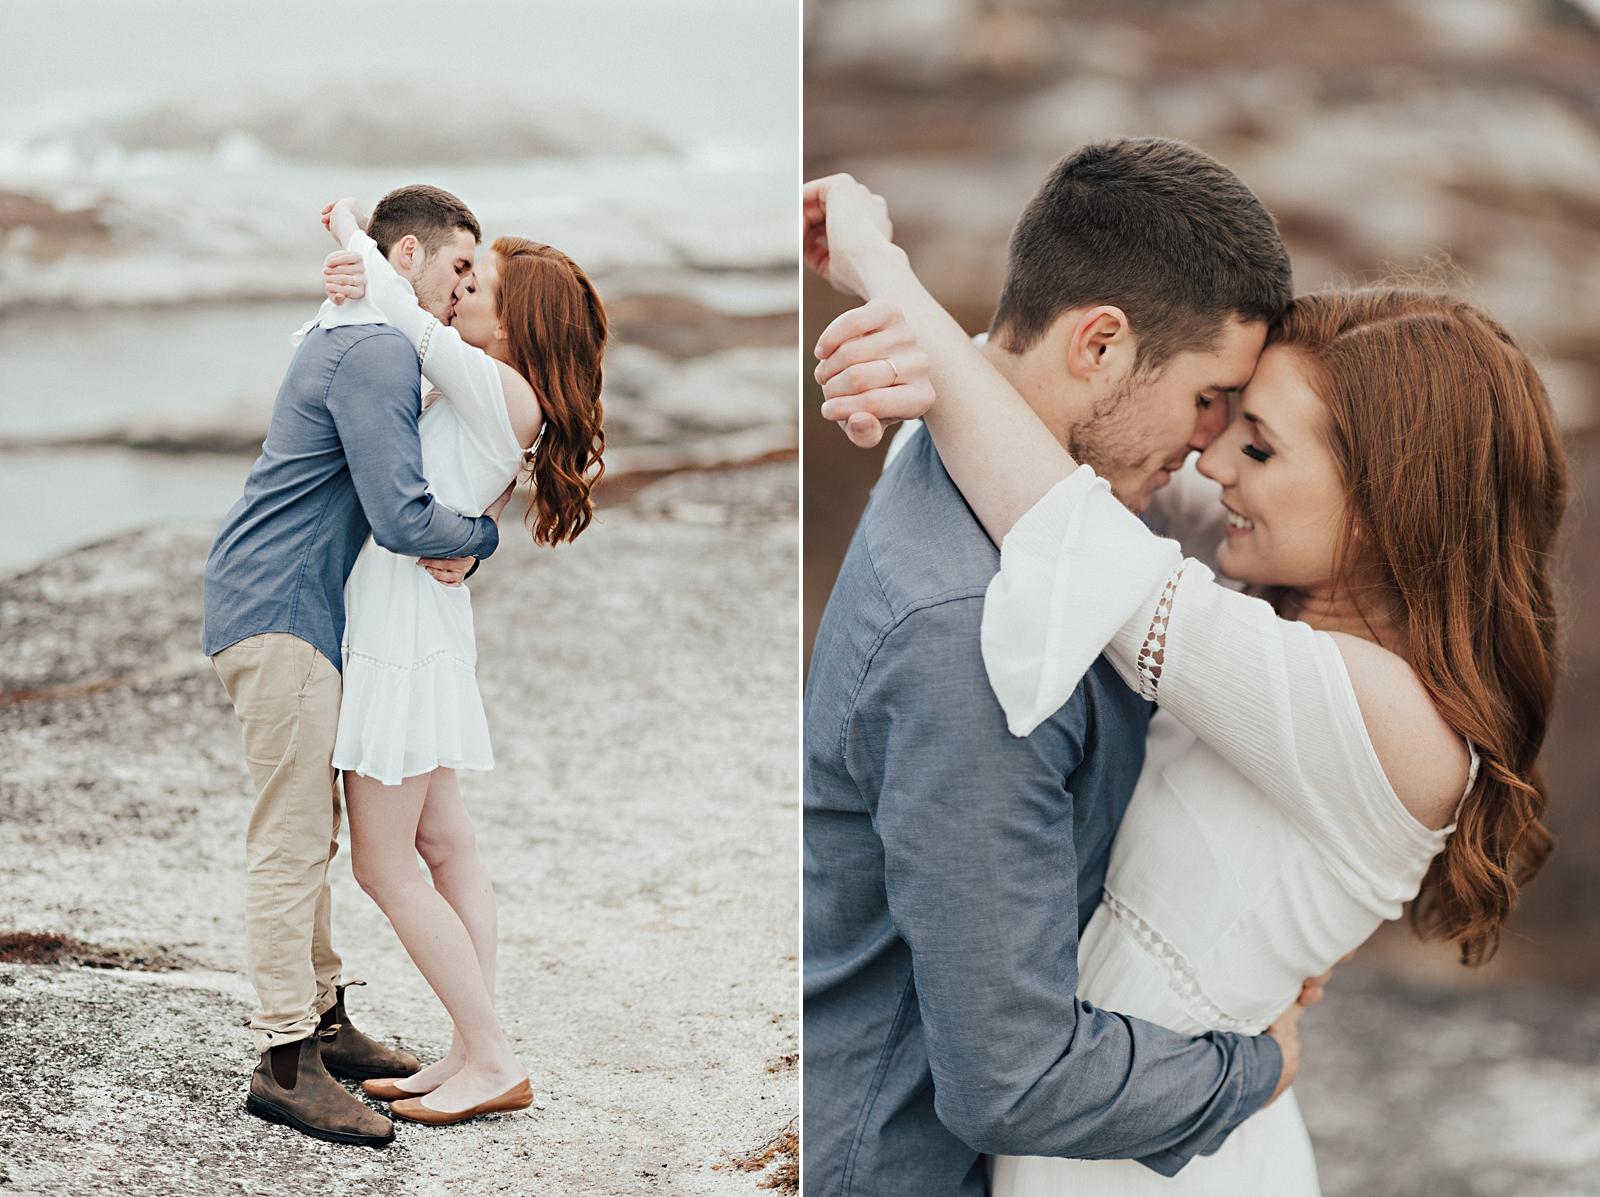 Halifax-Wedding-Photographer_Annie&Ryan_Ocean-Engagement-Shoot_12.jpg